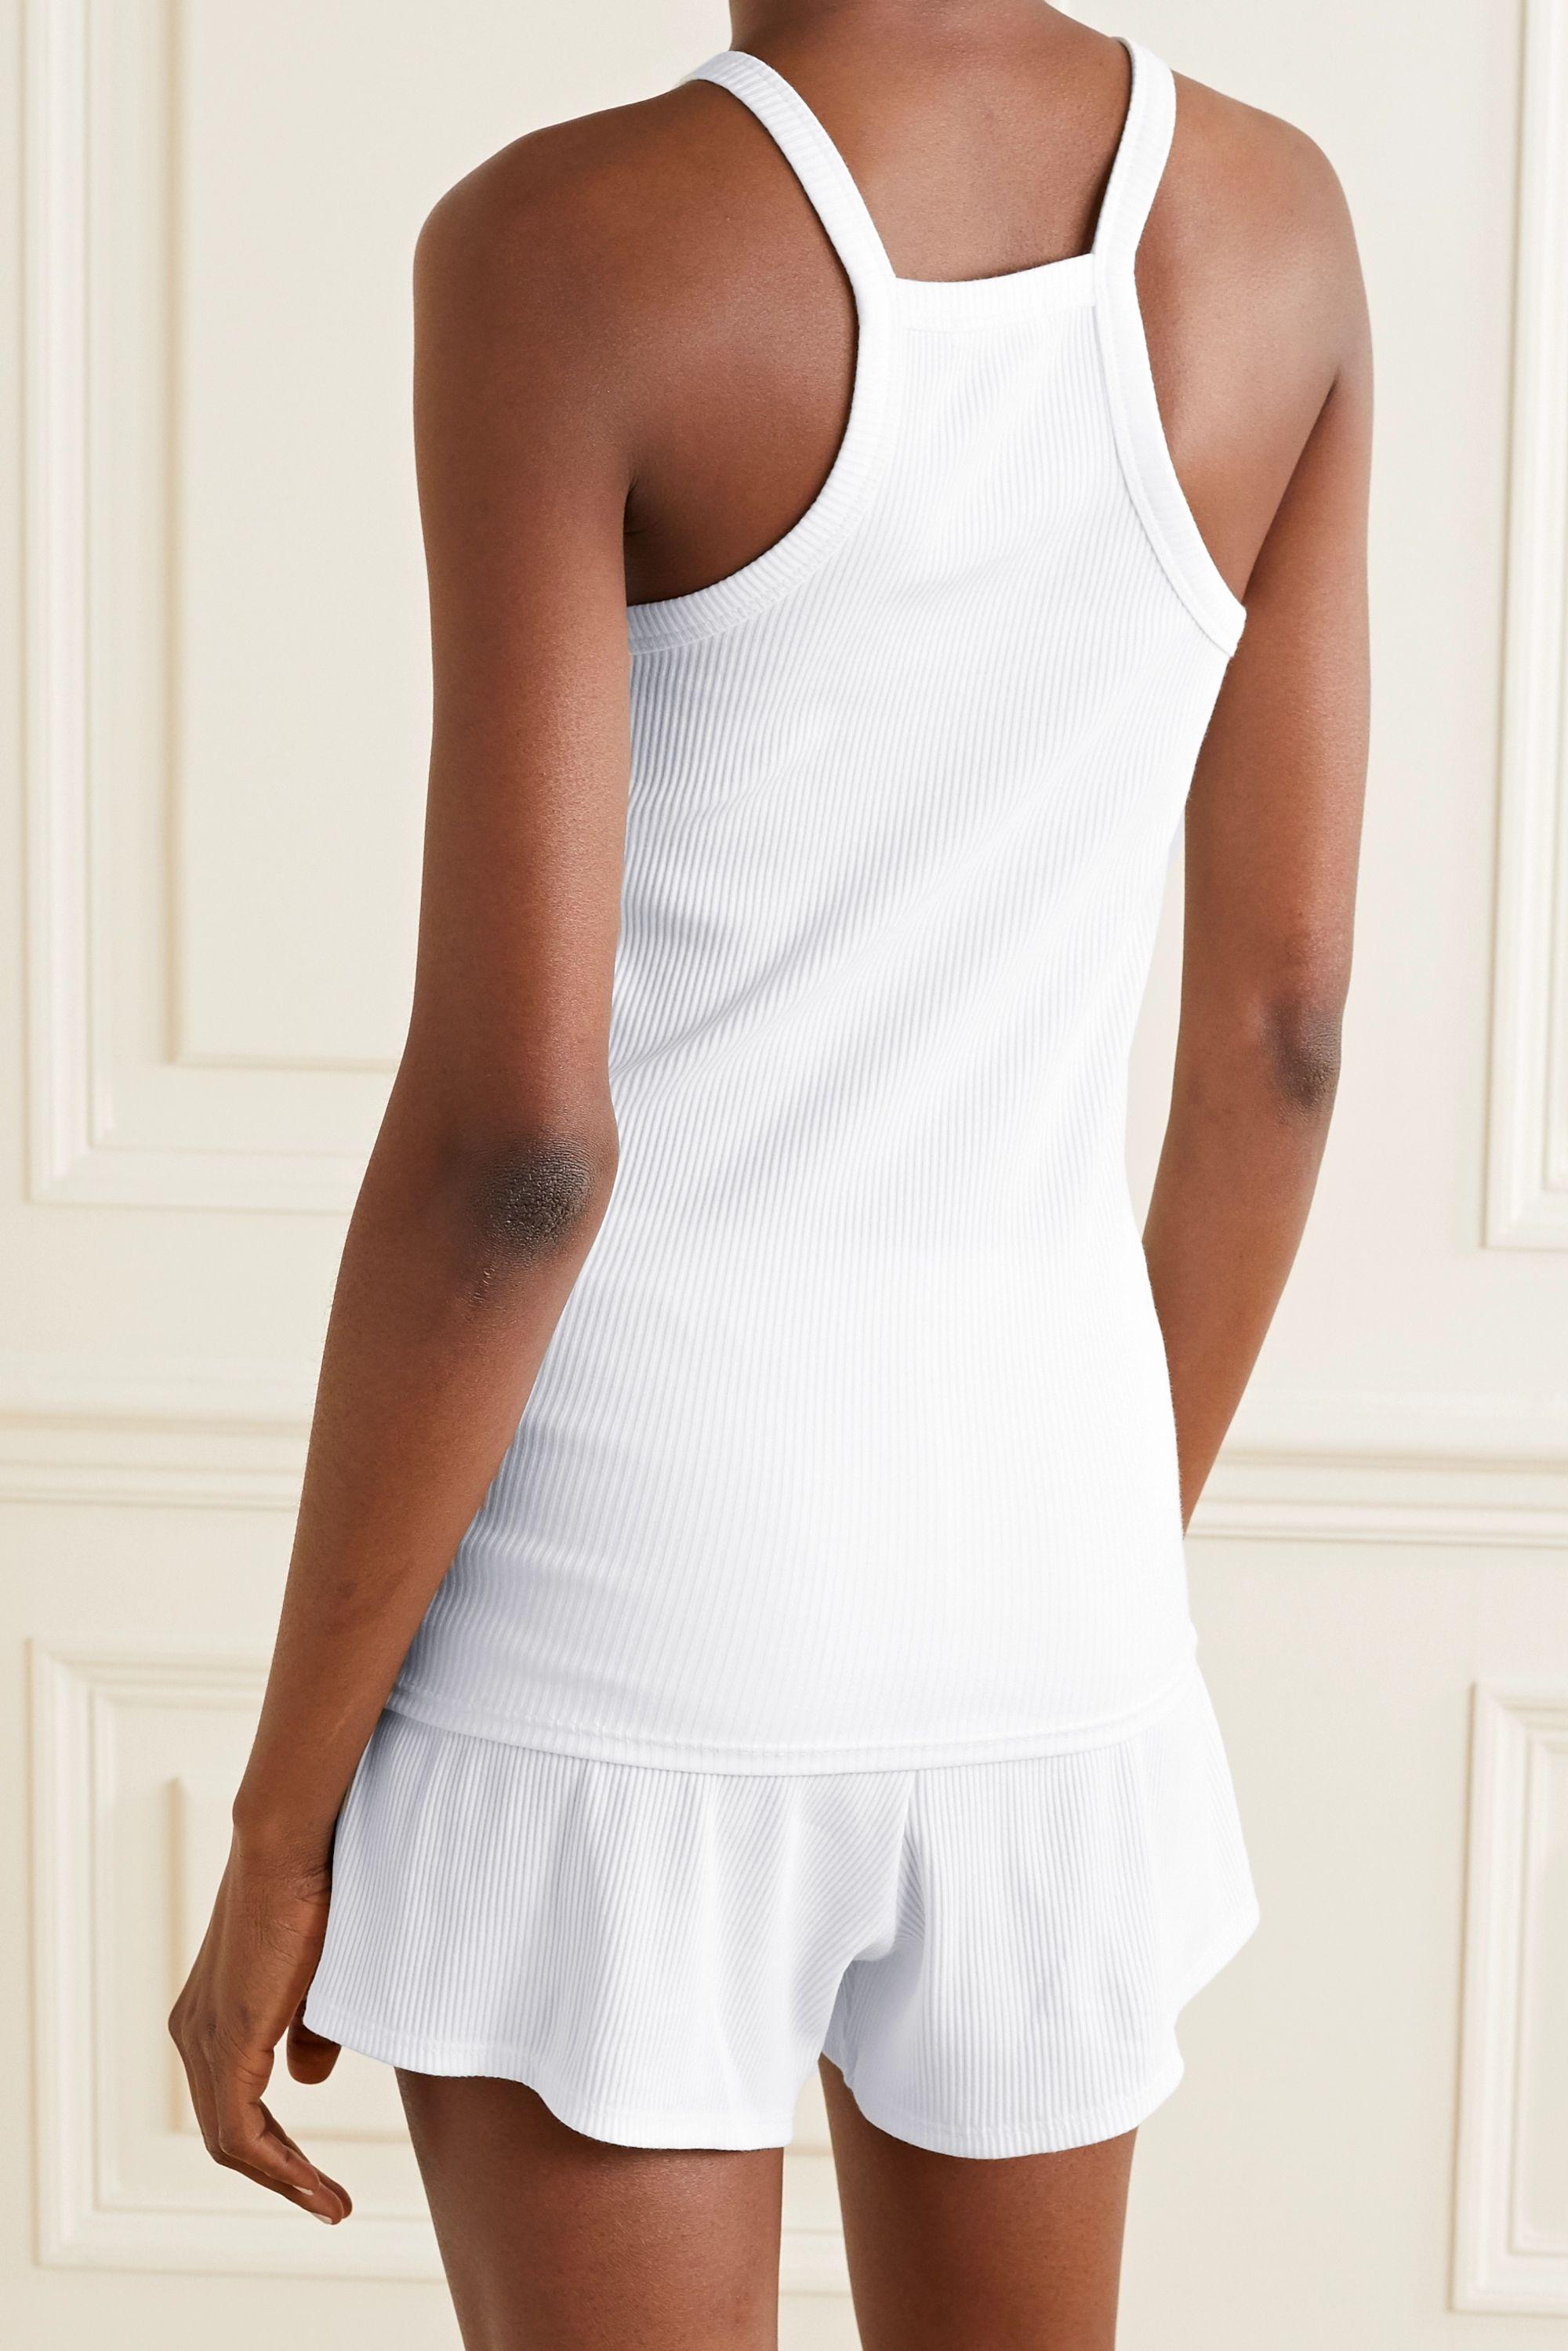 Skin Imogen ribbed stretch-Pima cotton jersey tank